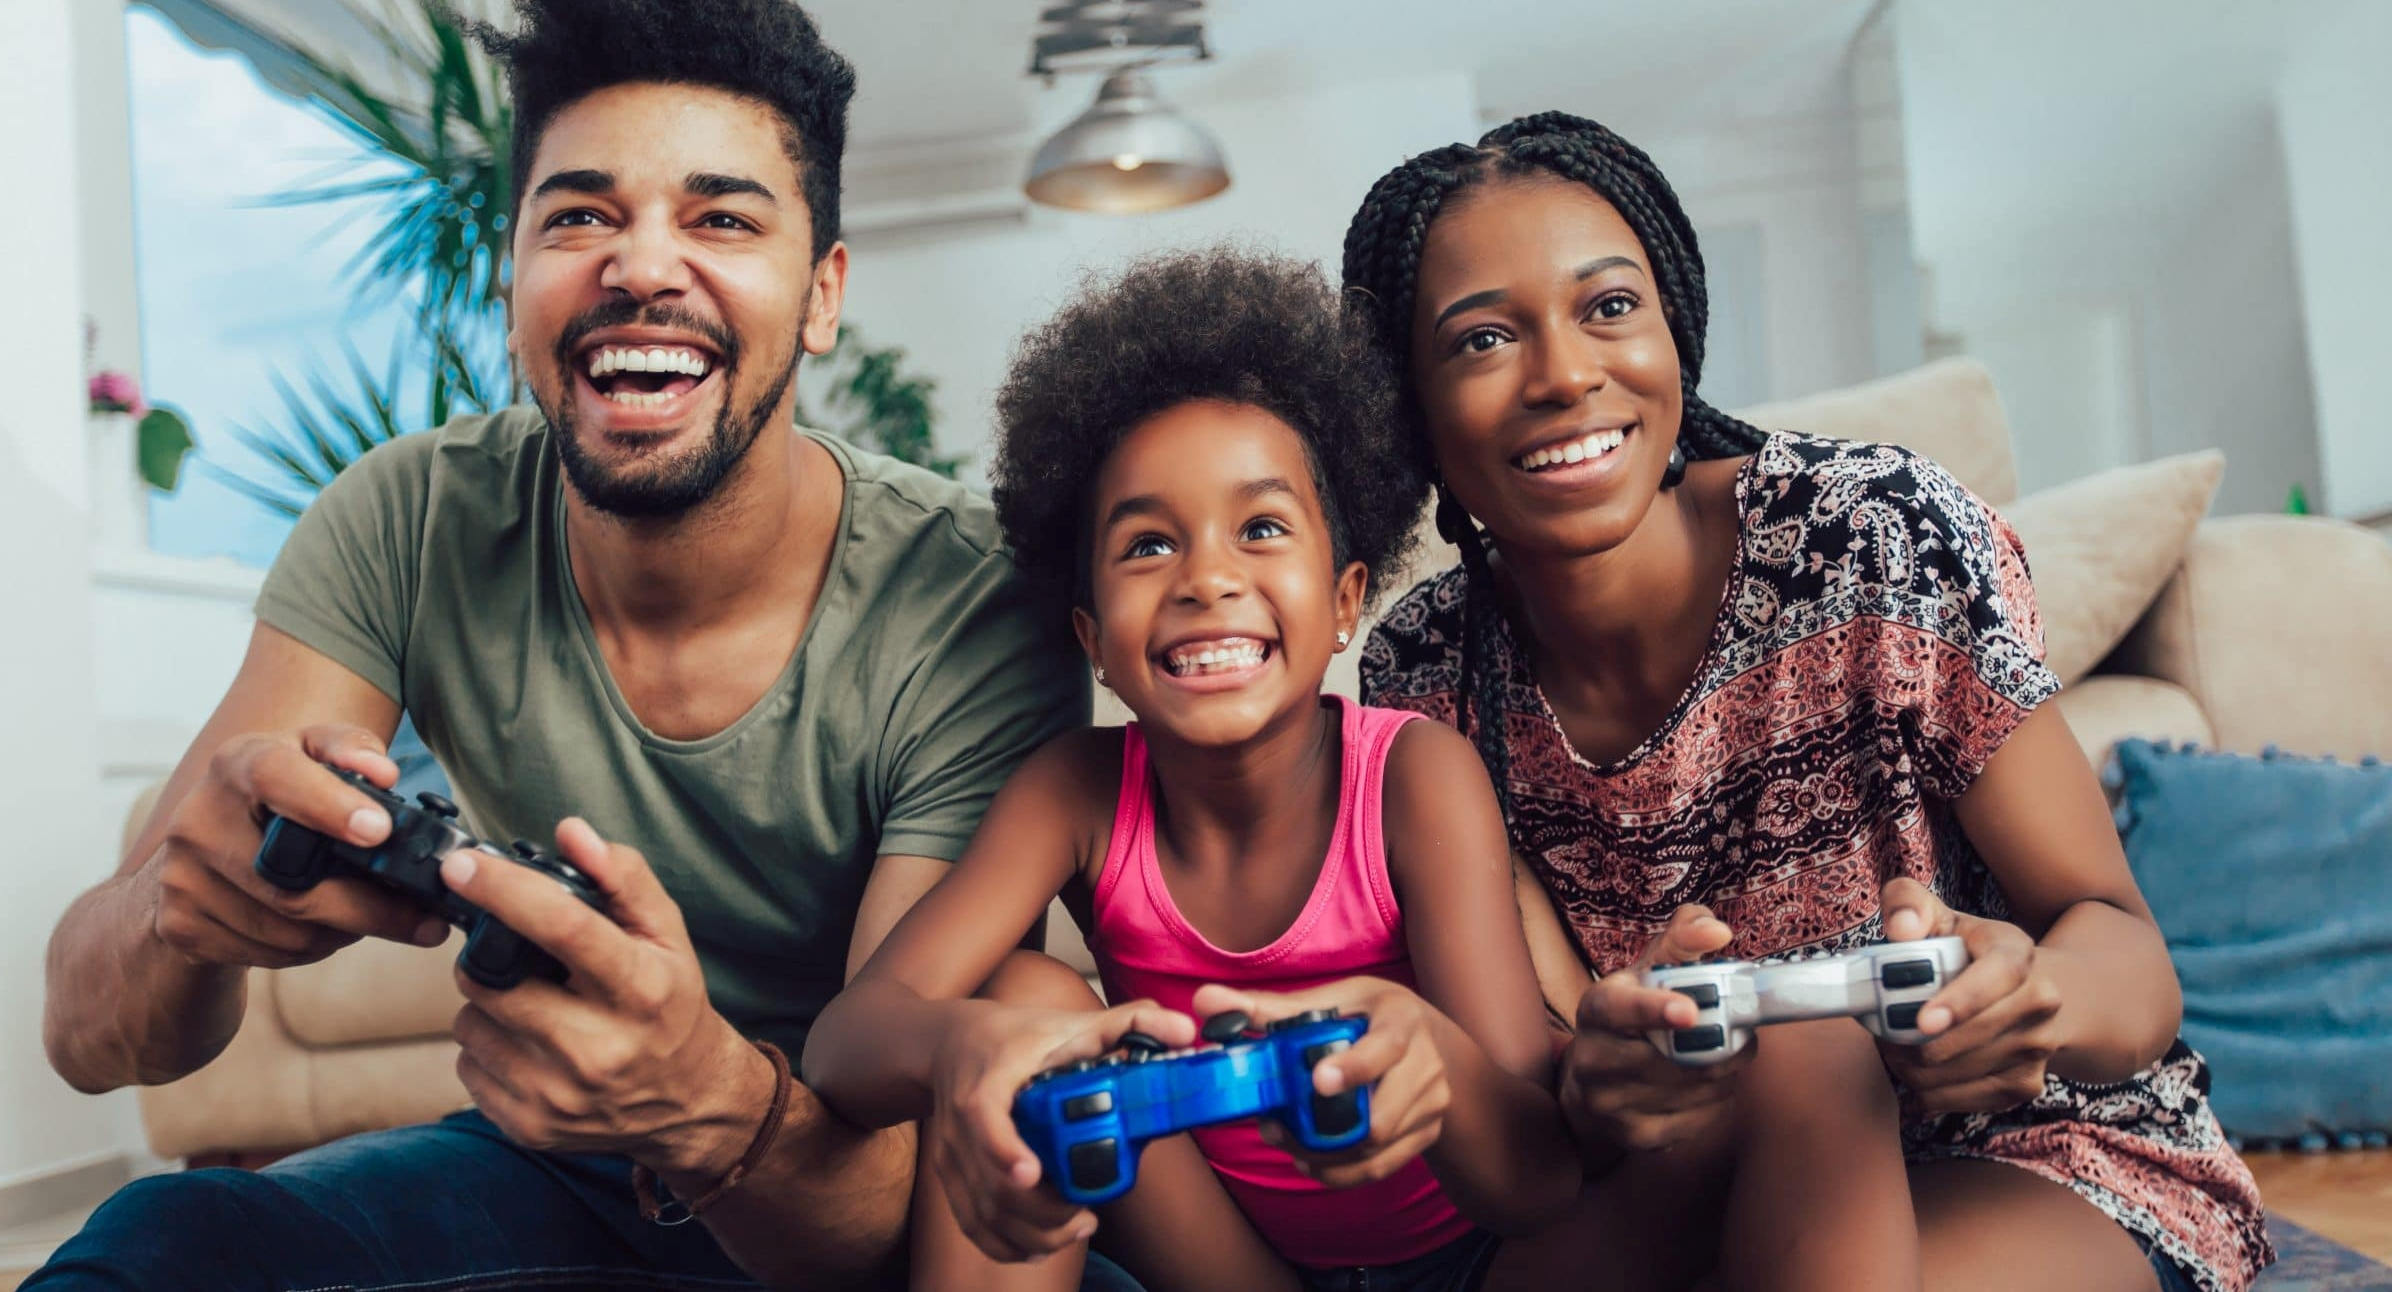 UK Interactive Entertainment Association Launches Get Smart About P.L.A.Y Campaign